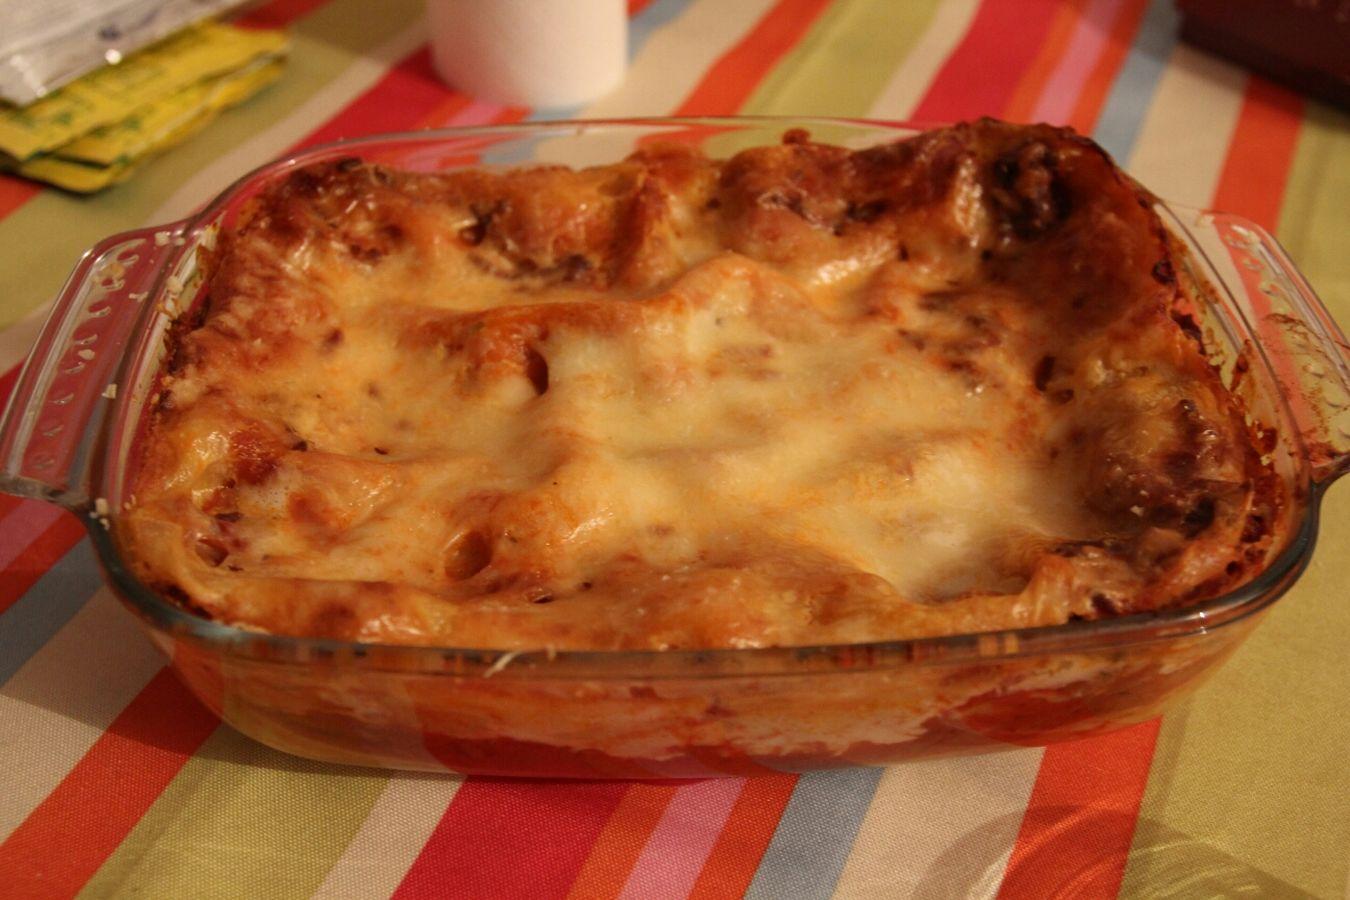 Yummy Food Porn Lasagne Homemade Lasagna